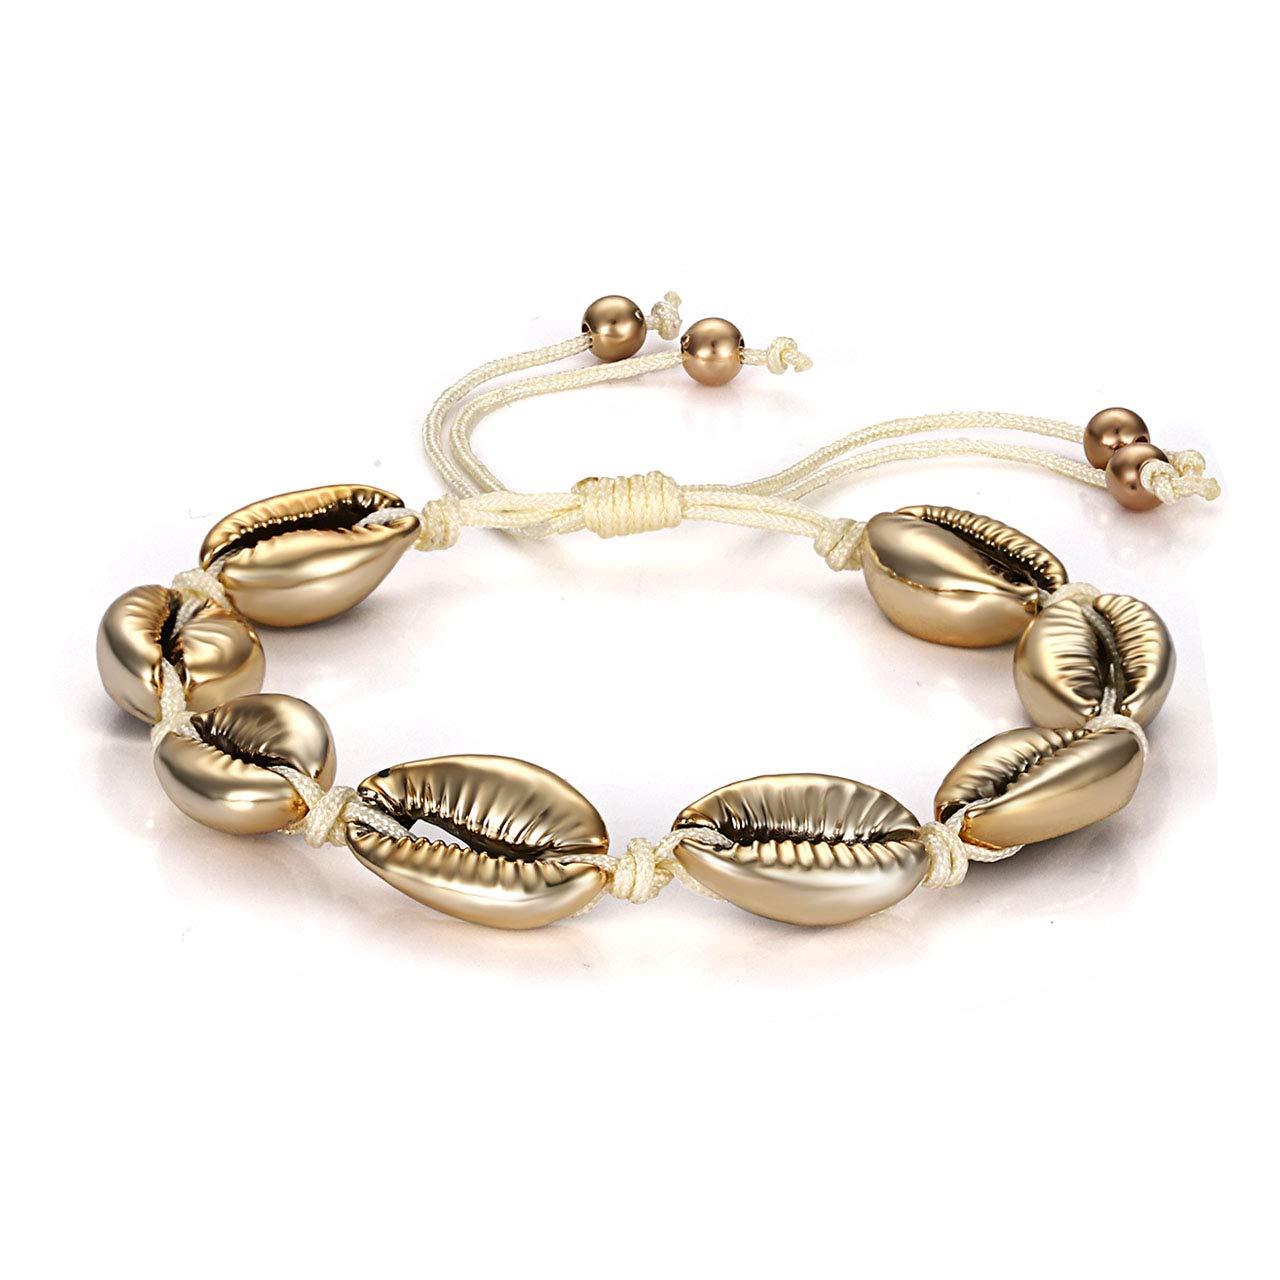 Tassel Jewellery Fetish Necklace Boho Tassels Necklace Gift for Women Boho Necklace Wife Gift Statement Necklace Fringe Necklace